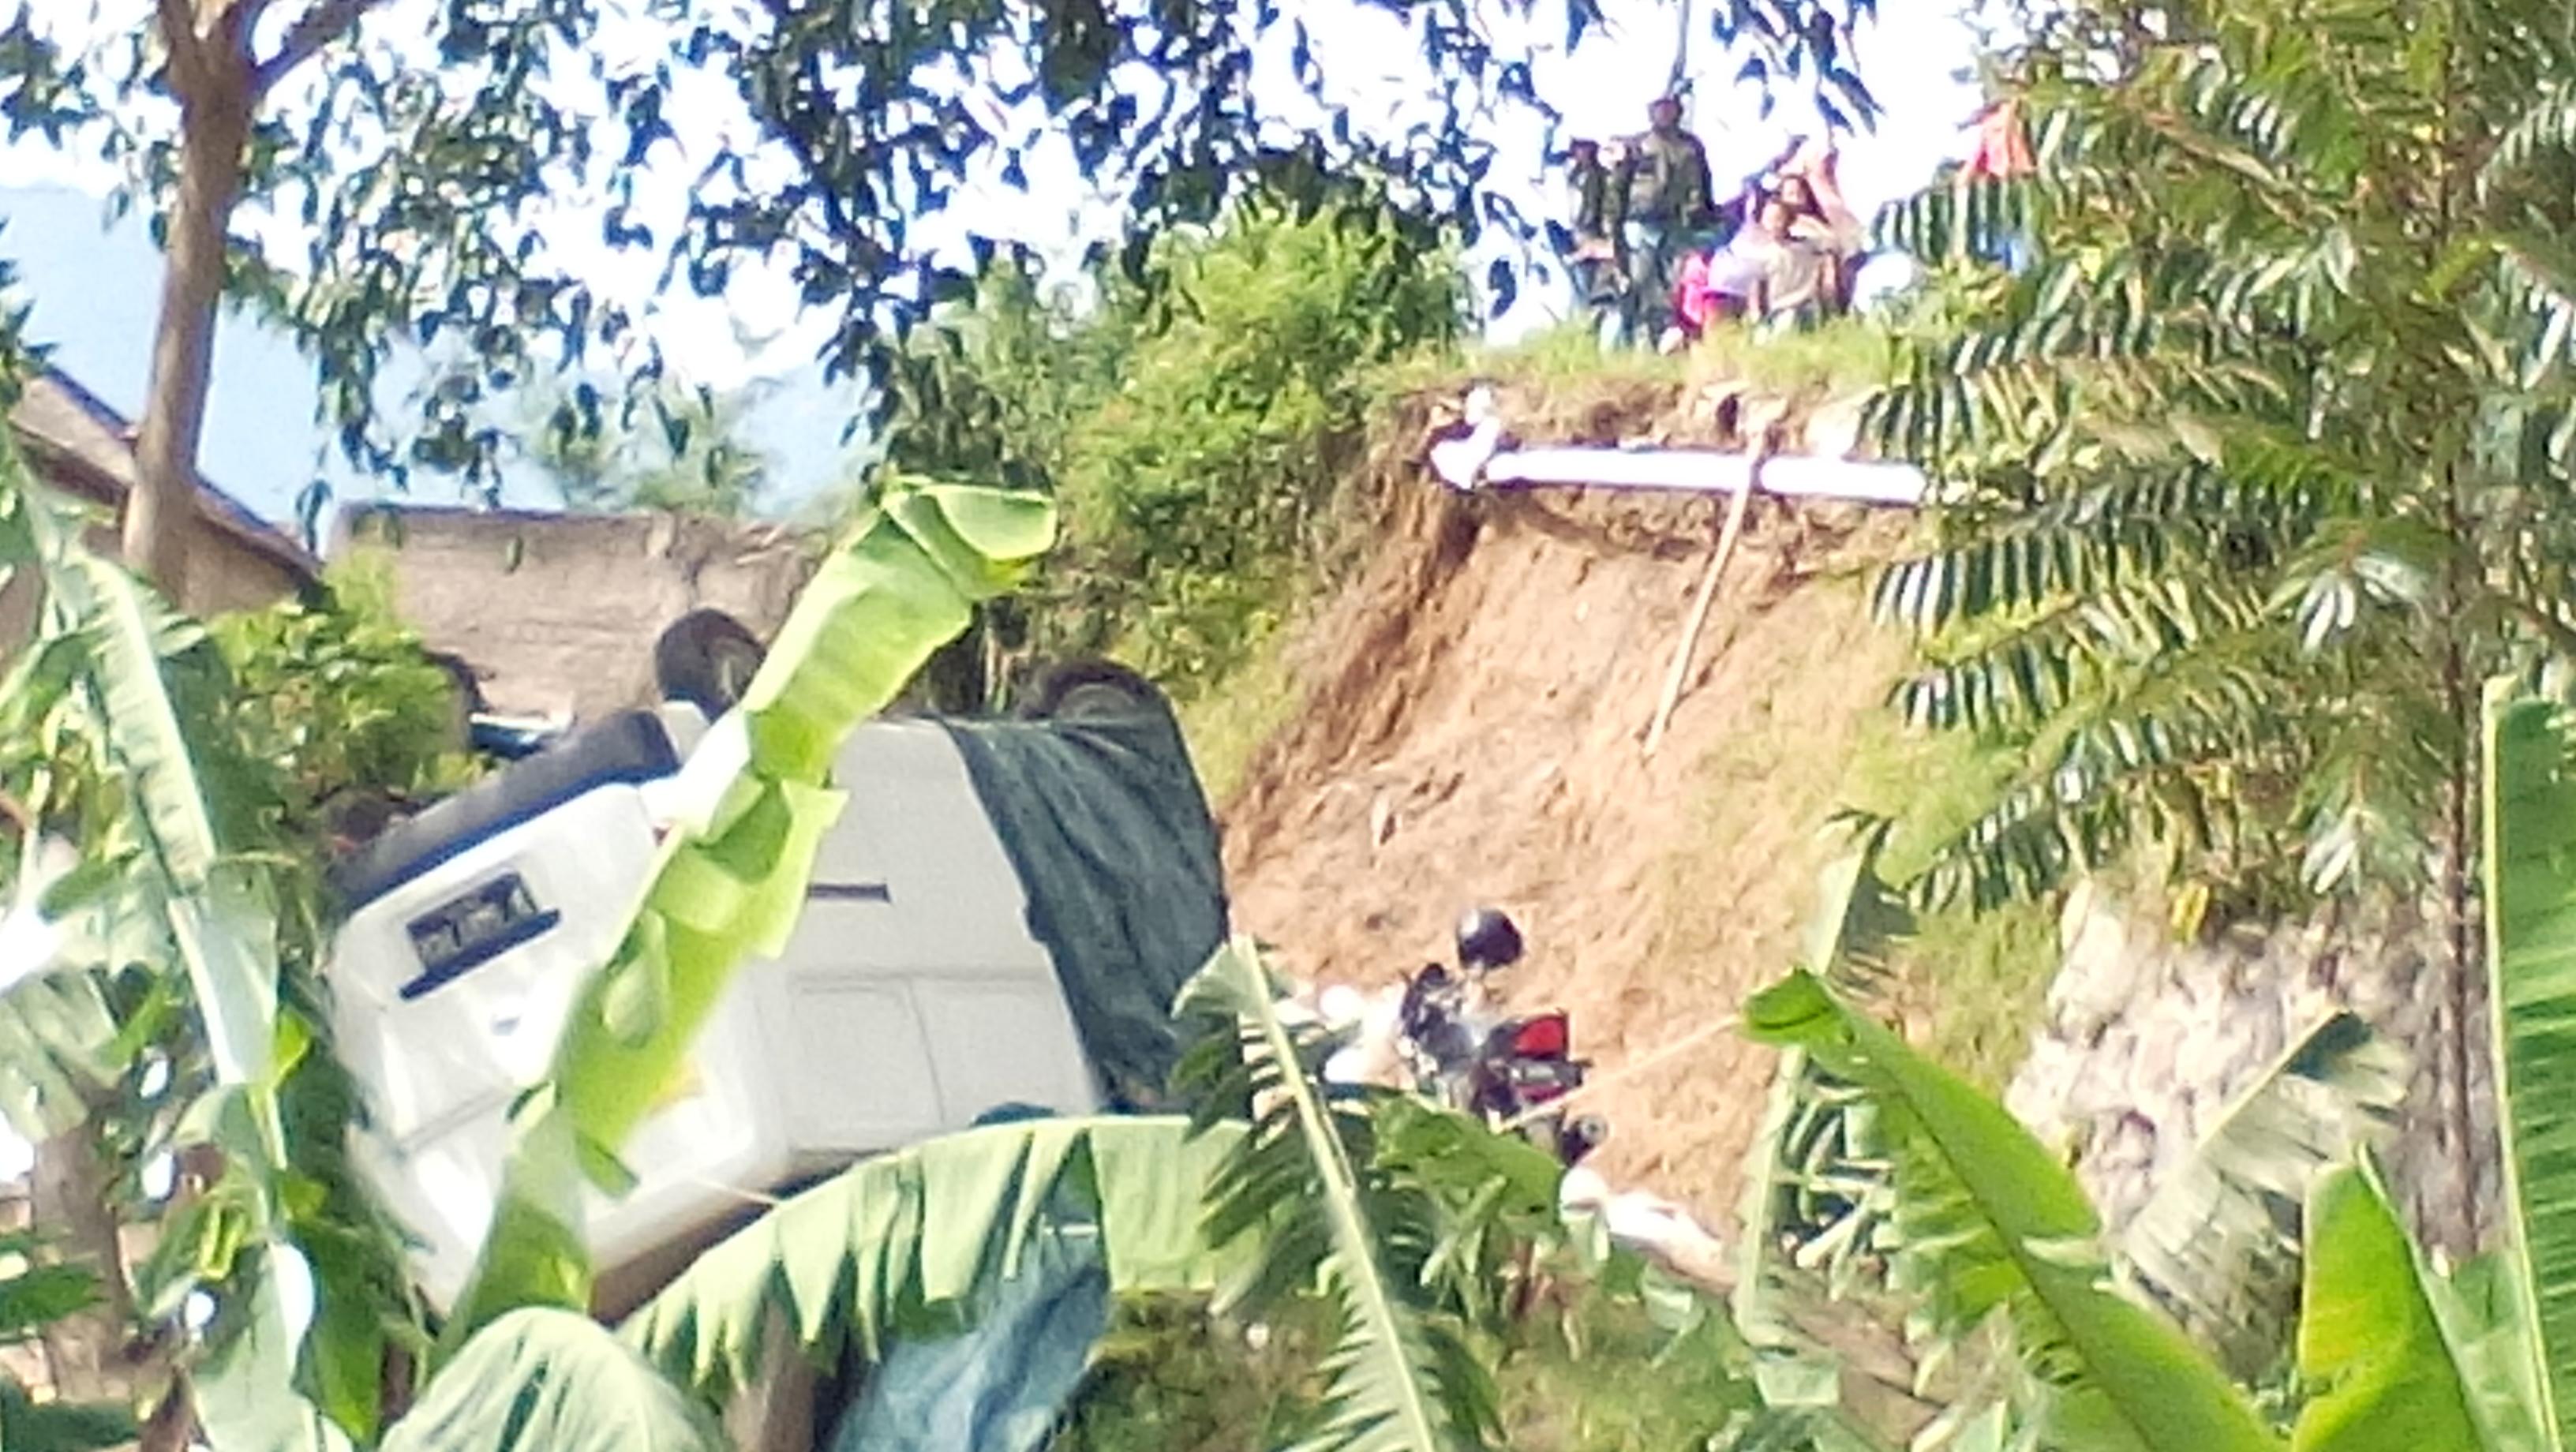 Polres Cimahi Dorong Dishub Segera Pasang Pagar Pengaman Jalan Parongpong